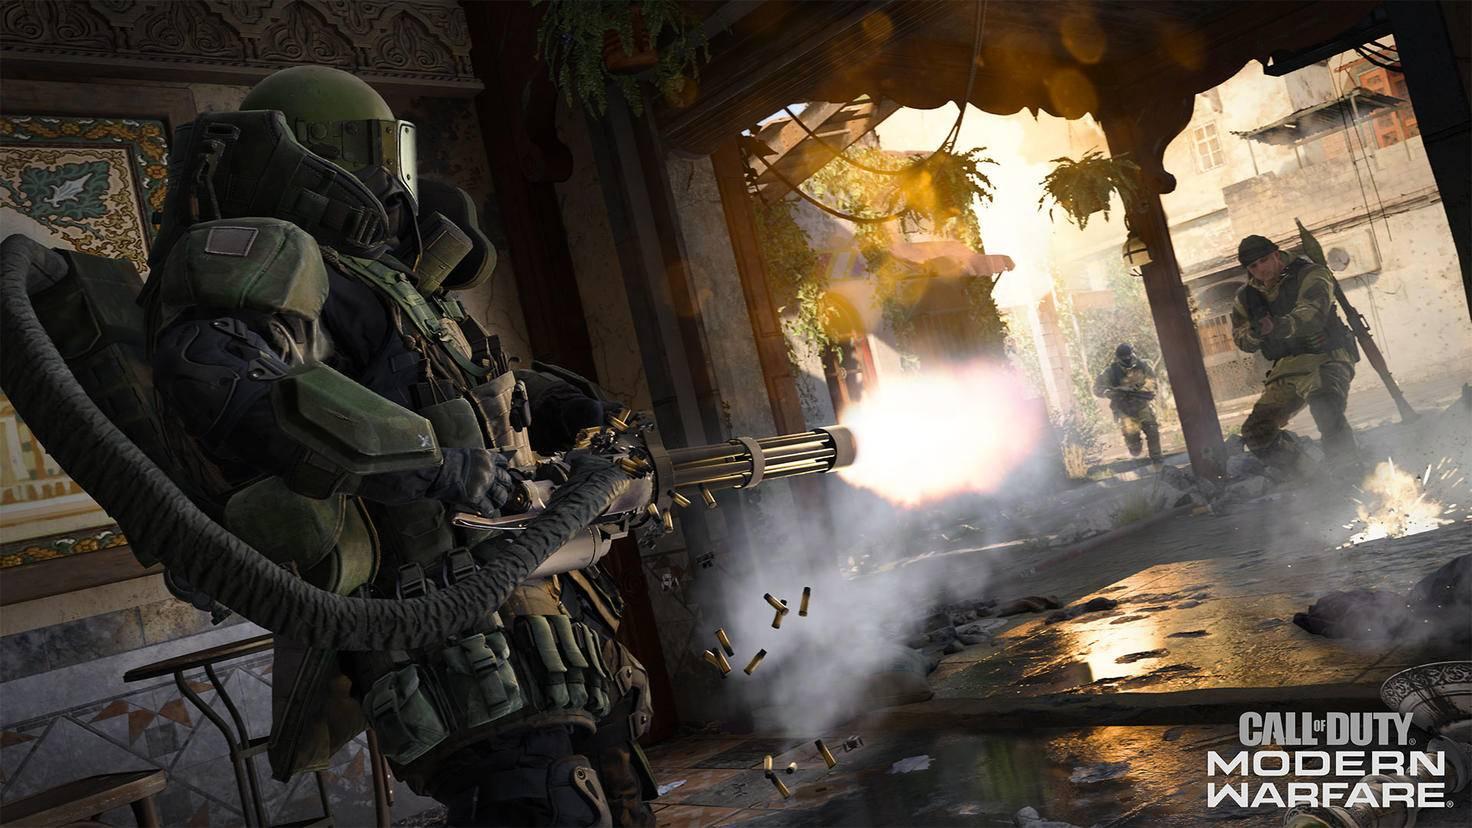 call-of-duty-modern-warfare-juggernaut